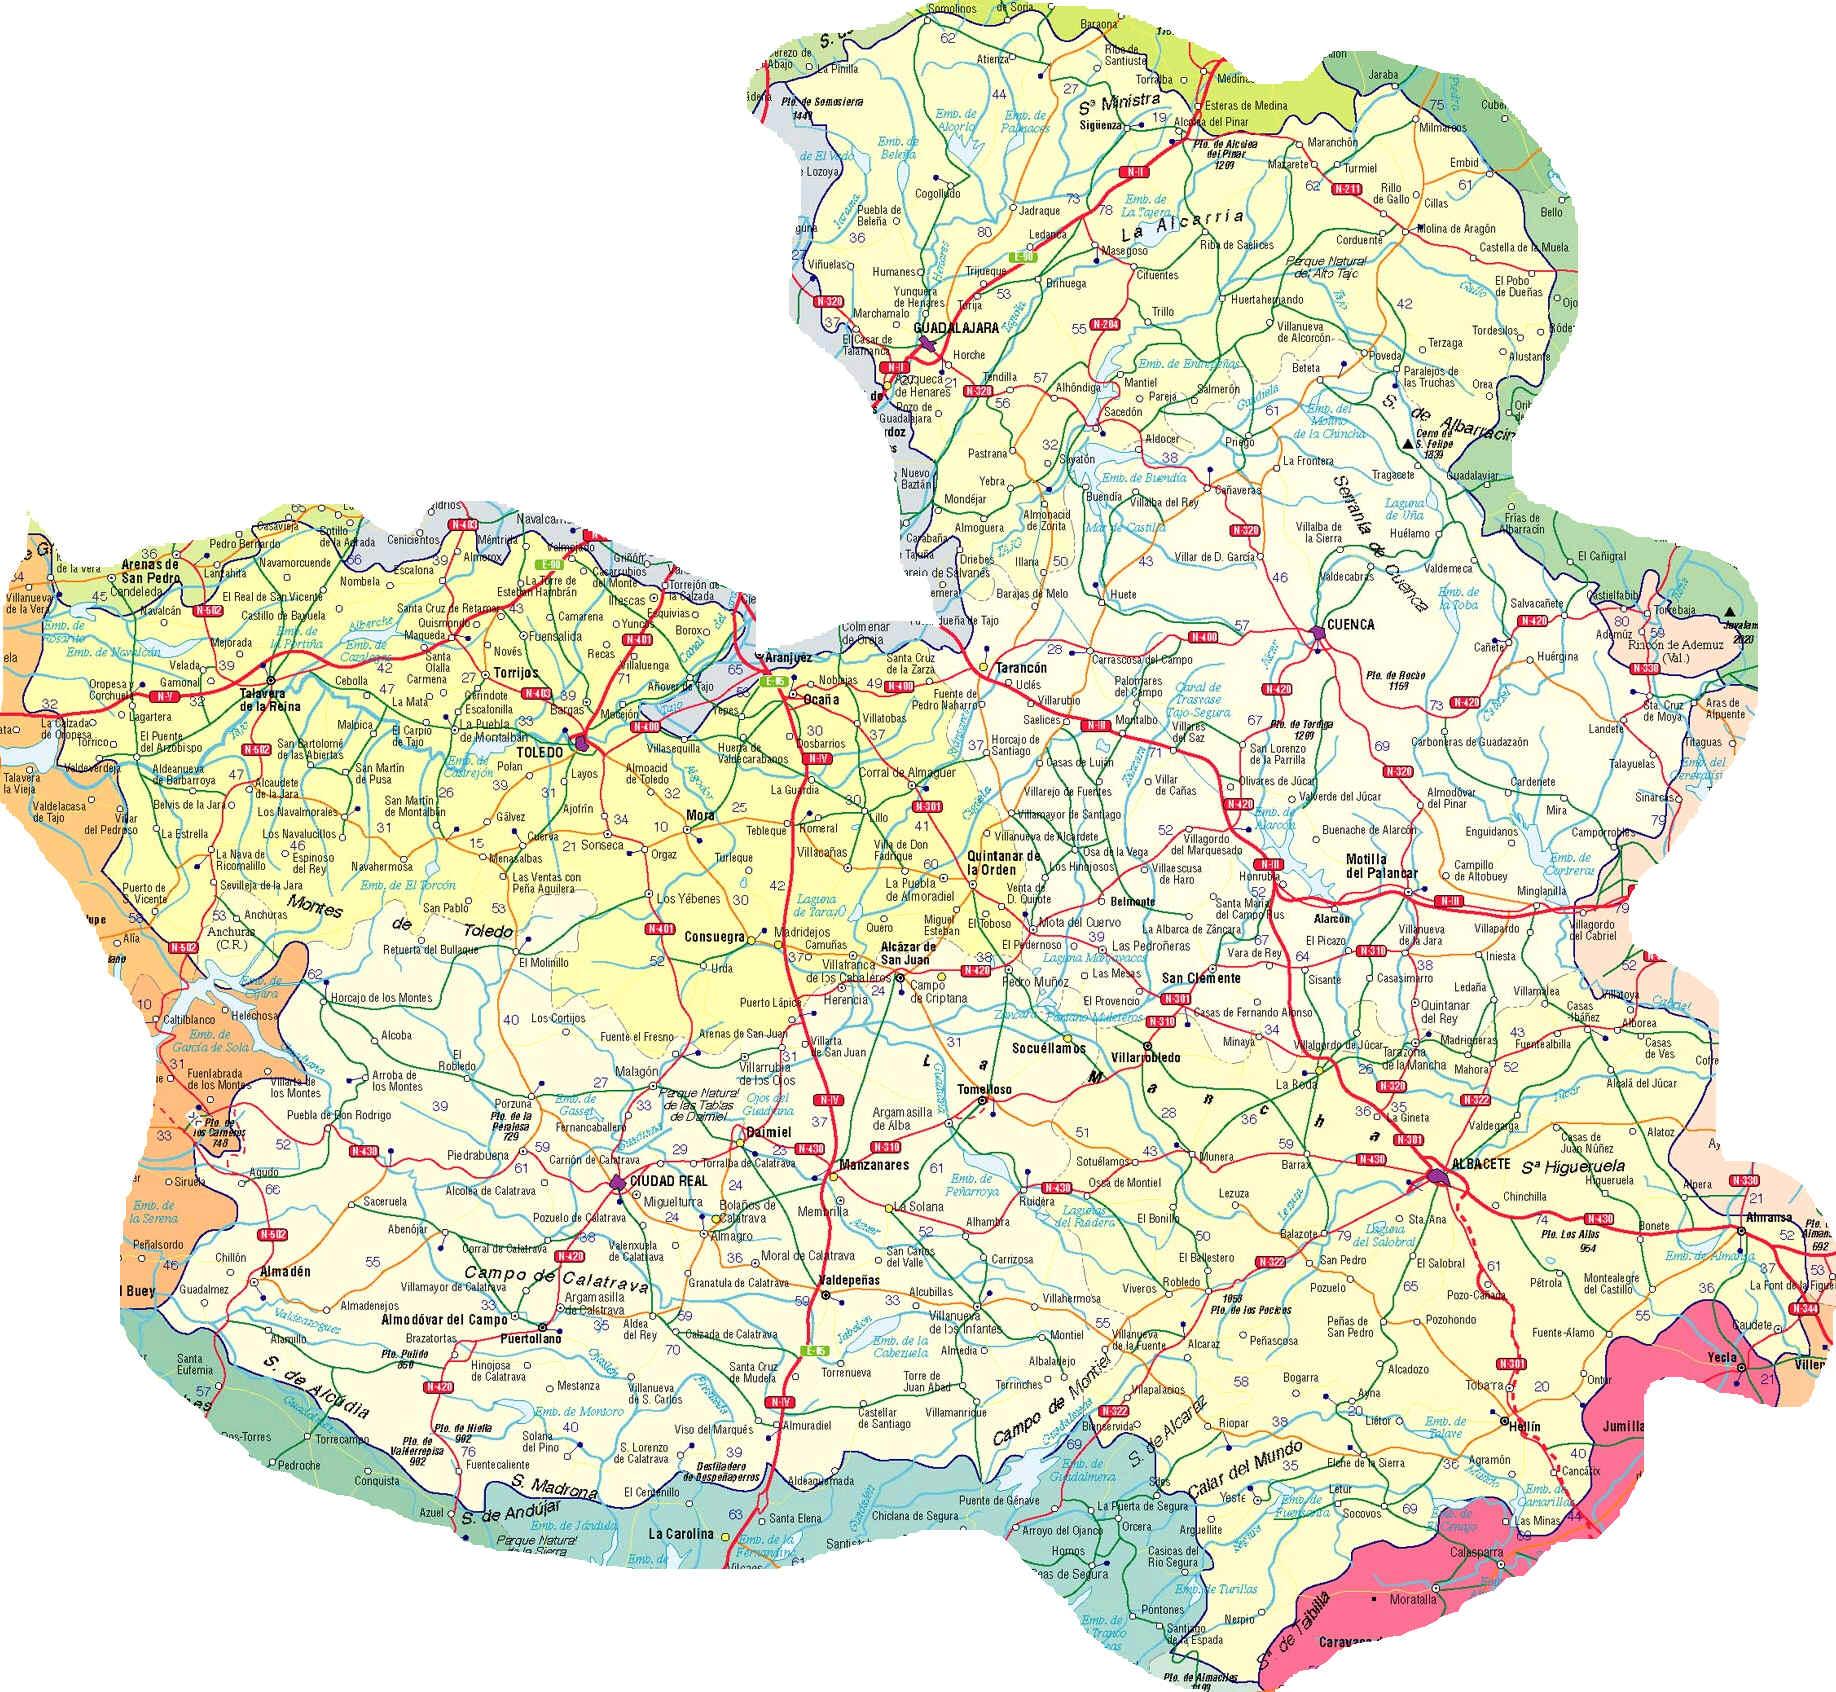 Castile and León map